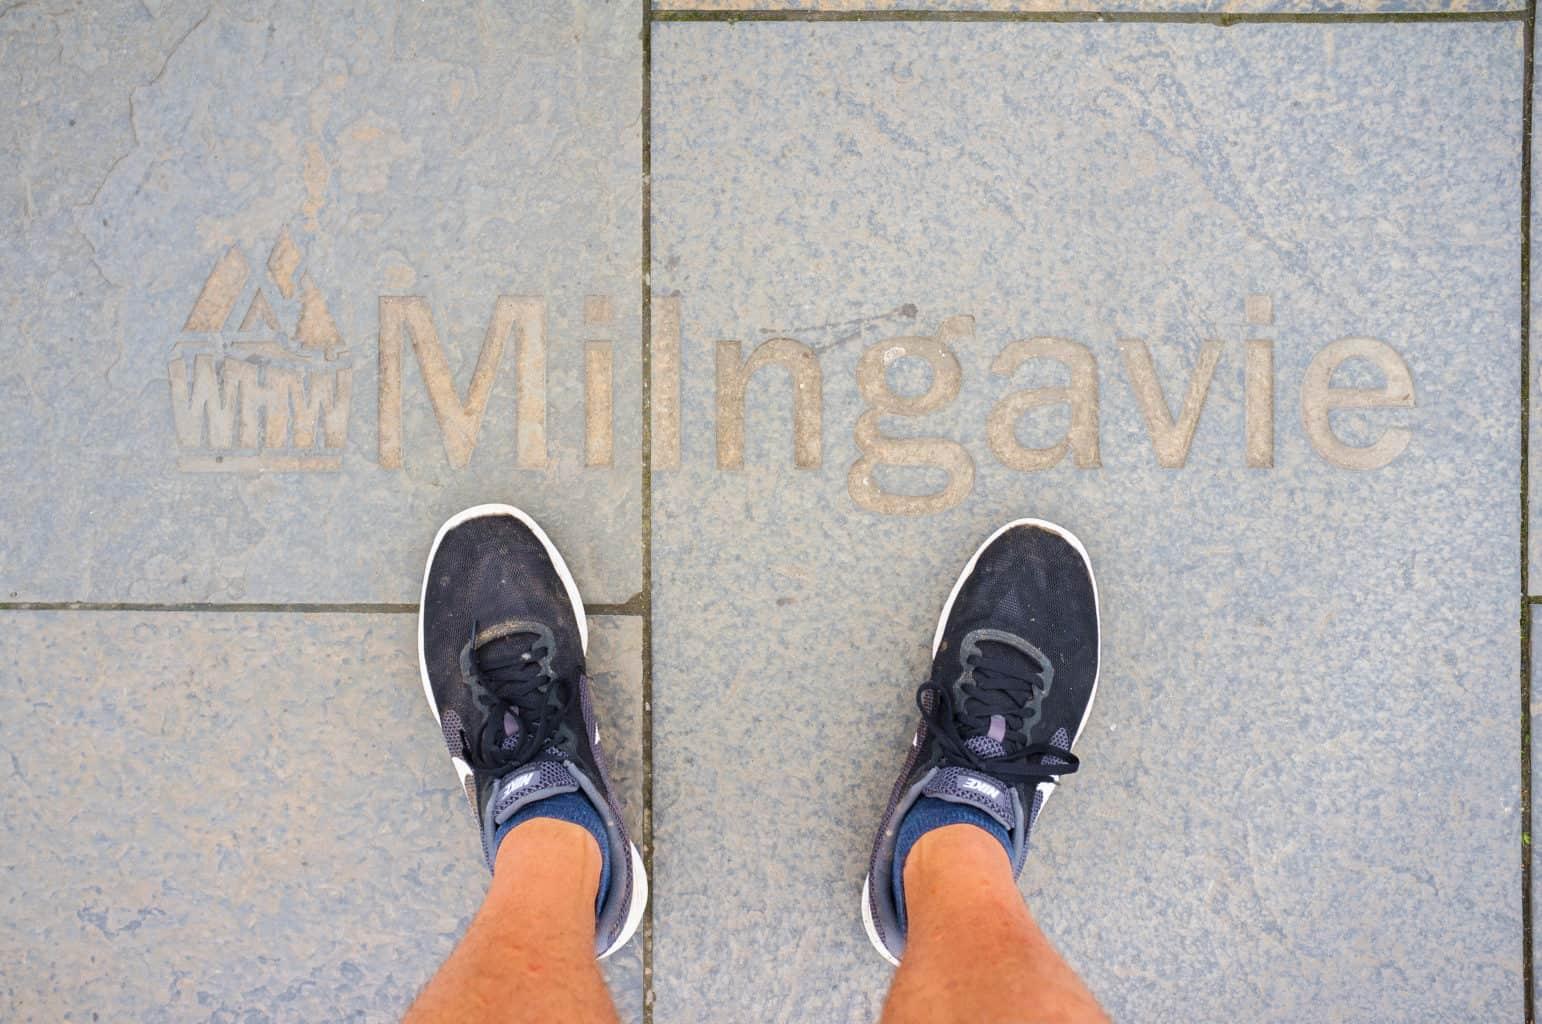 West Highland Way Milngavie pavement sign